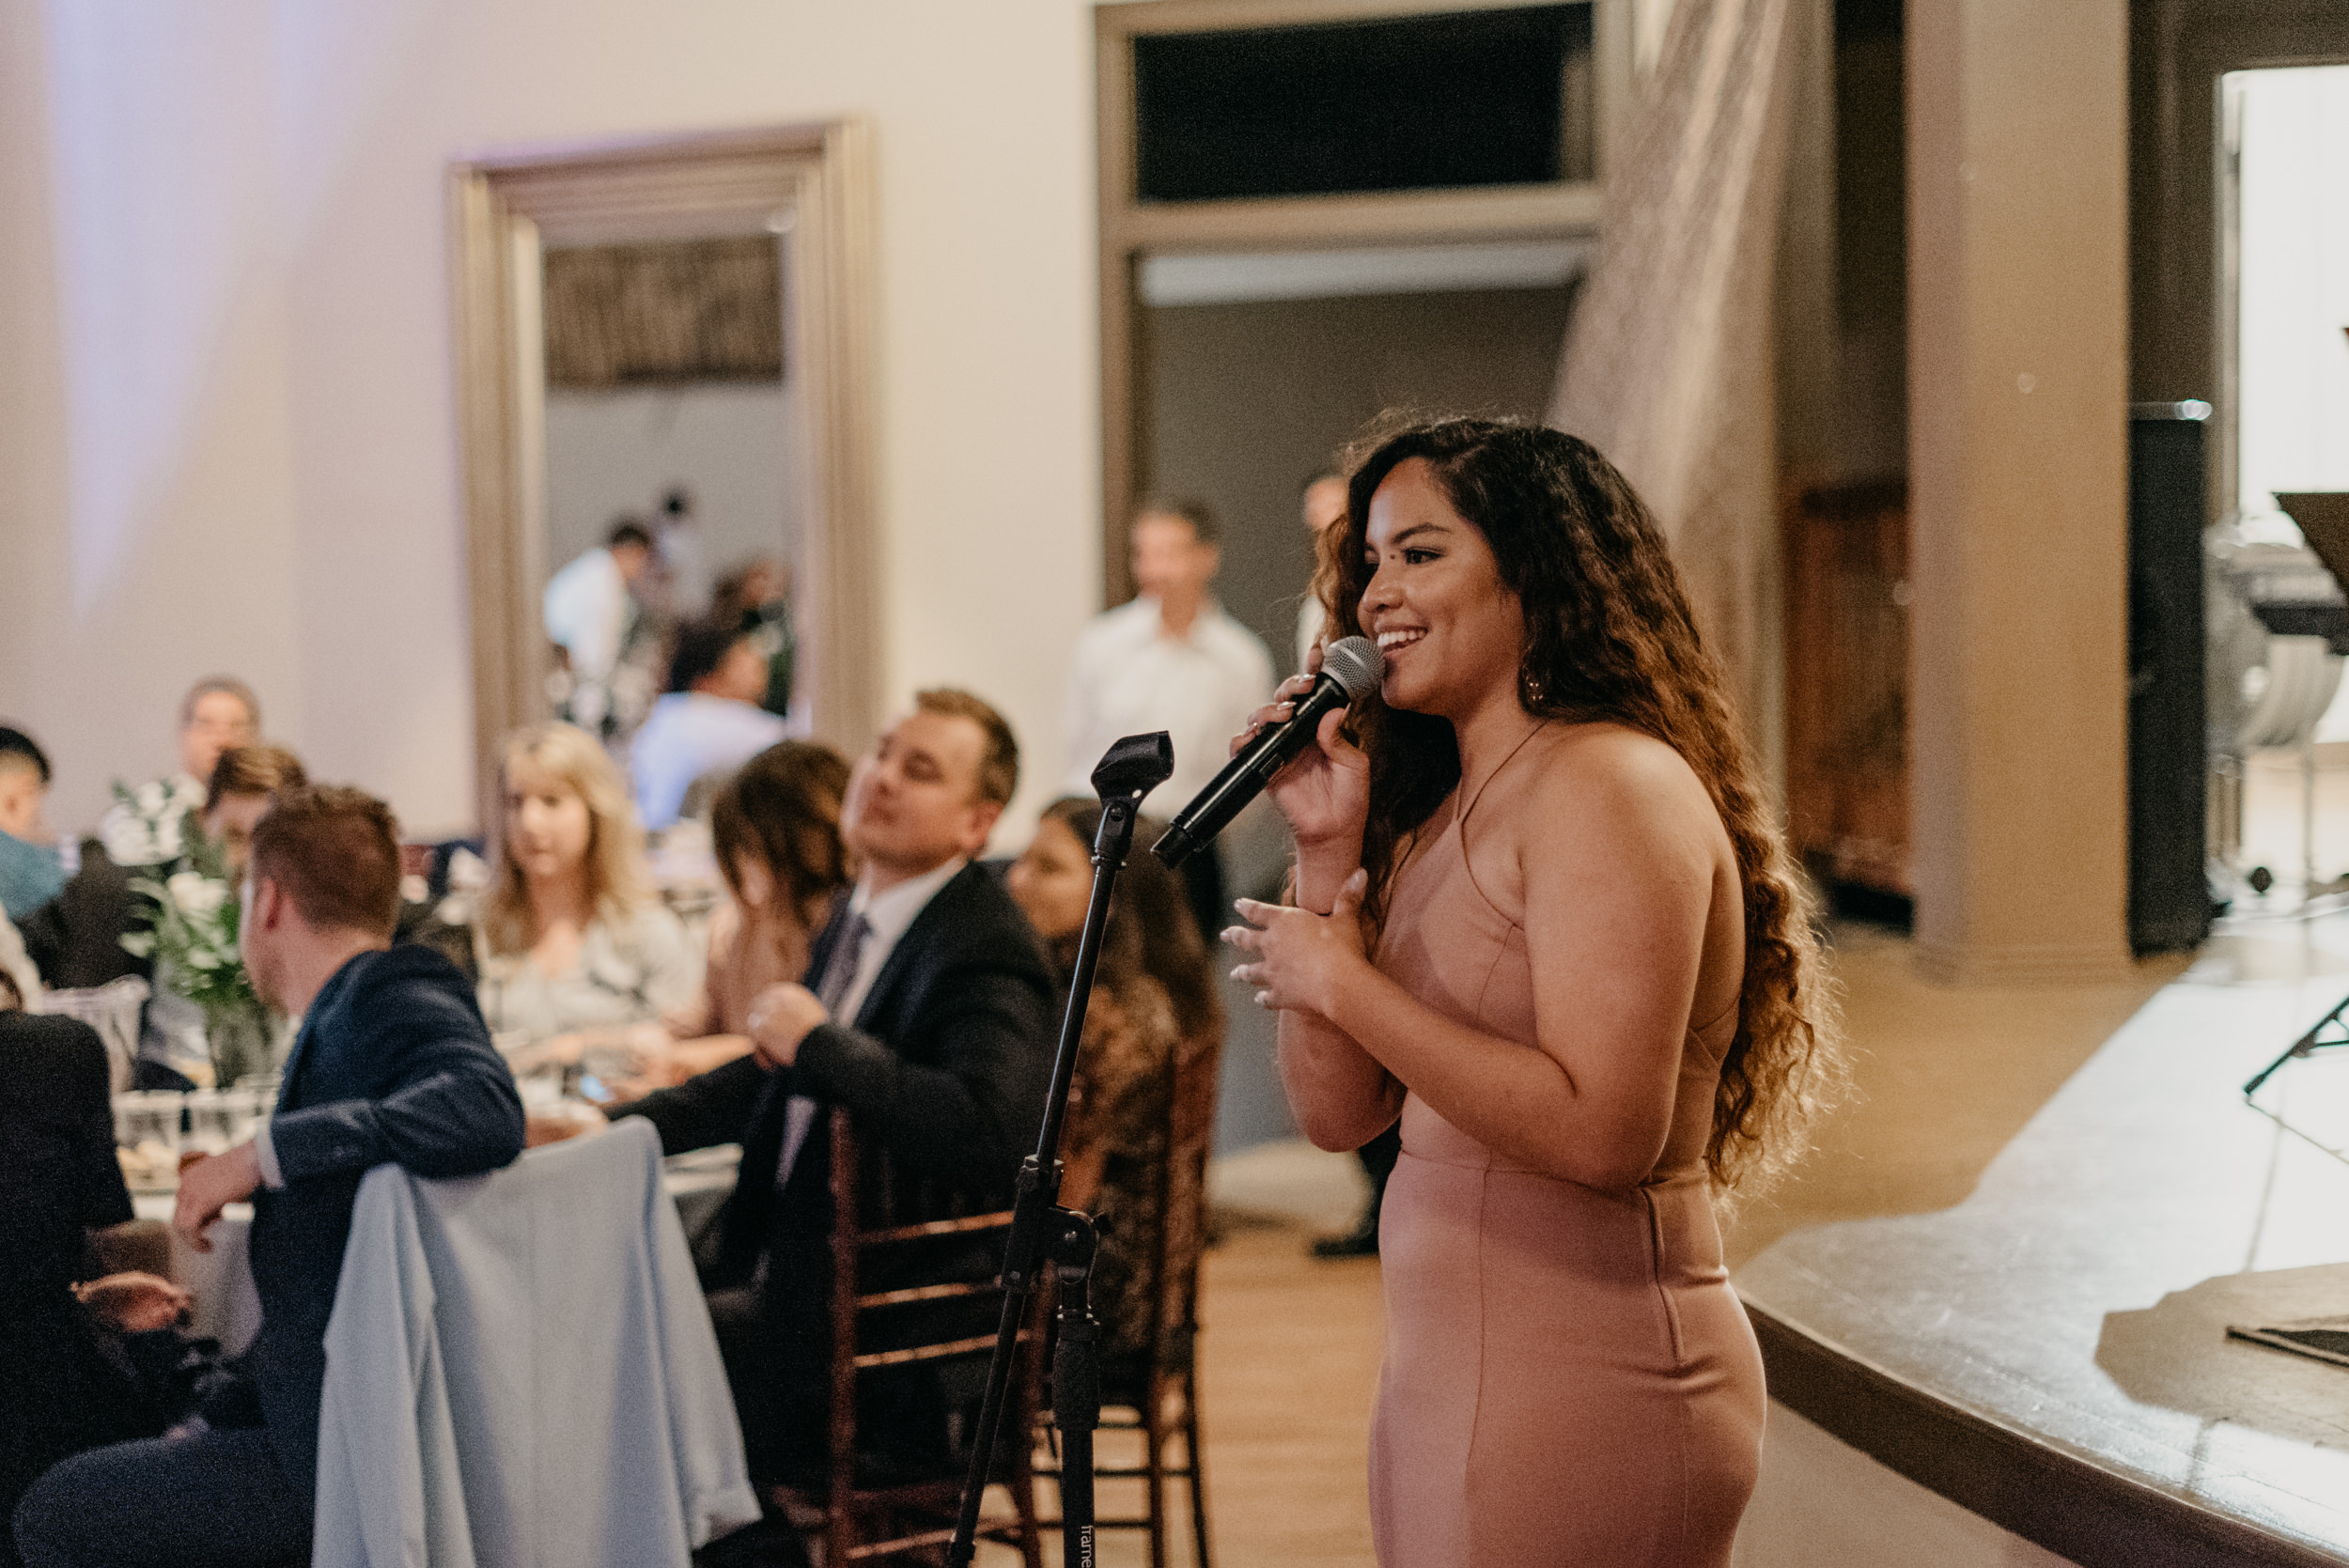 107-reception-west-end-ballroom-portland-wedding-photographer-9391.jpg